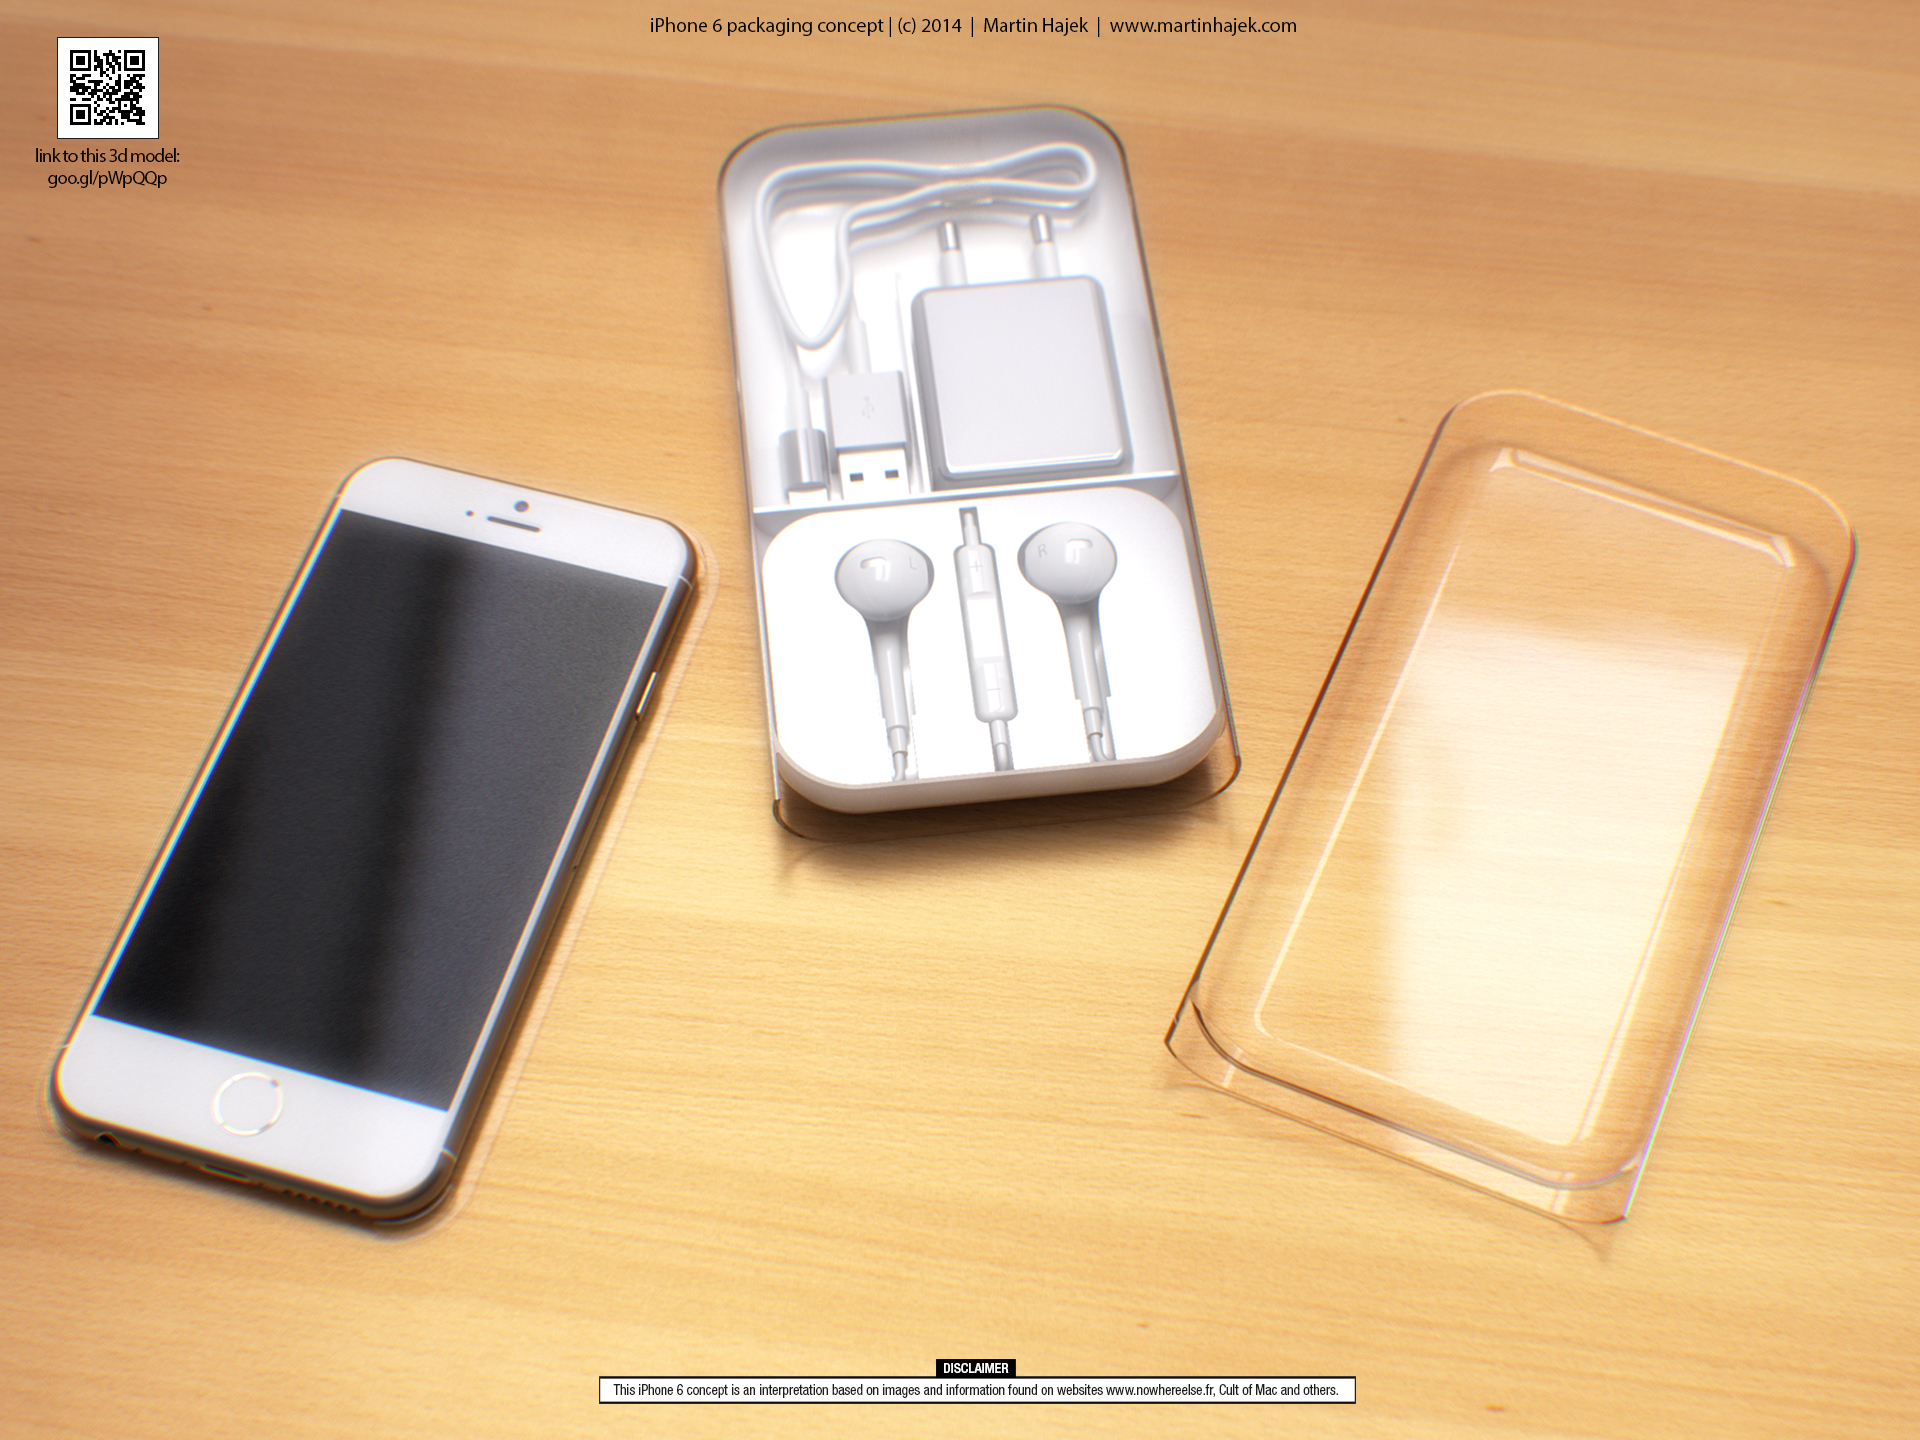 iPhone 6 concept (Packaging, Martin Hajek 001)